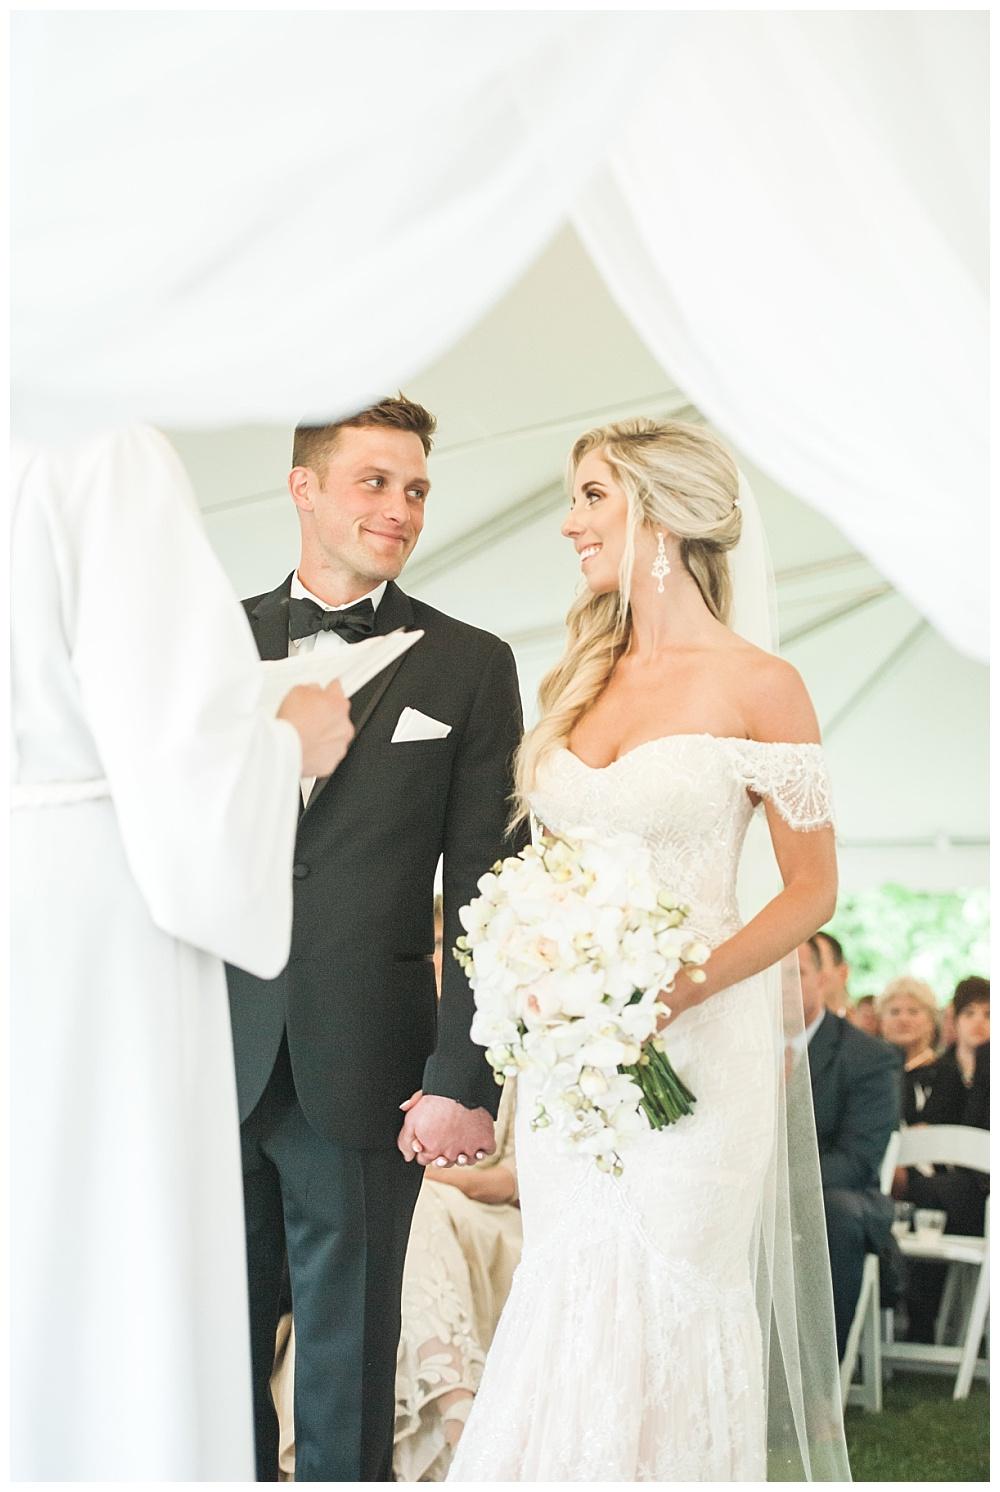 Stephanie Marie Photography TPC Deere Run Quad Cities Iowa City Wedding Photographer Ben Erin Dittmer_0048.jpg